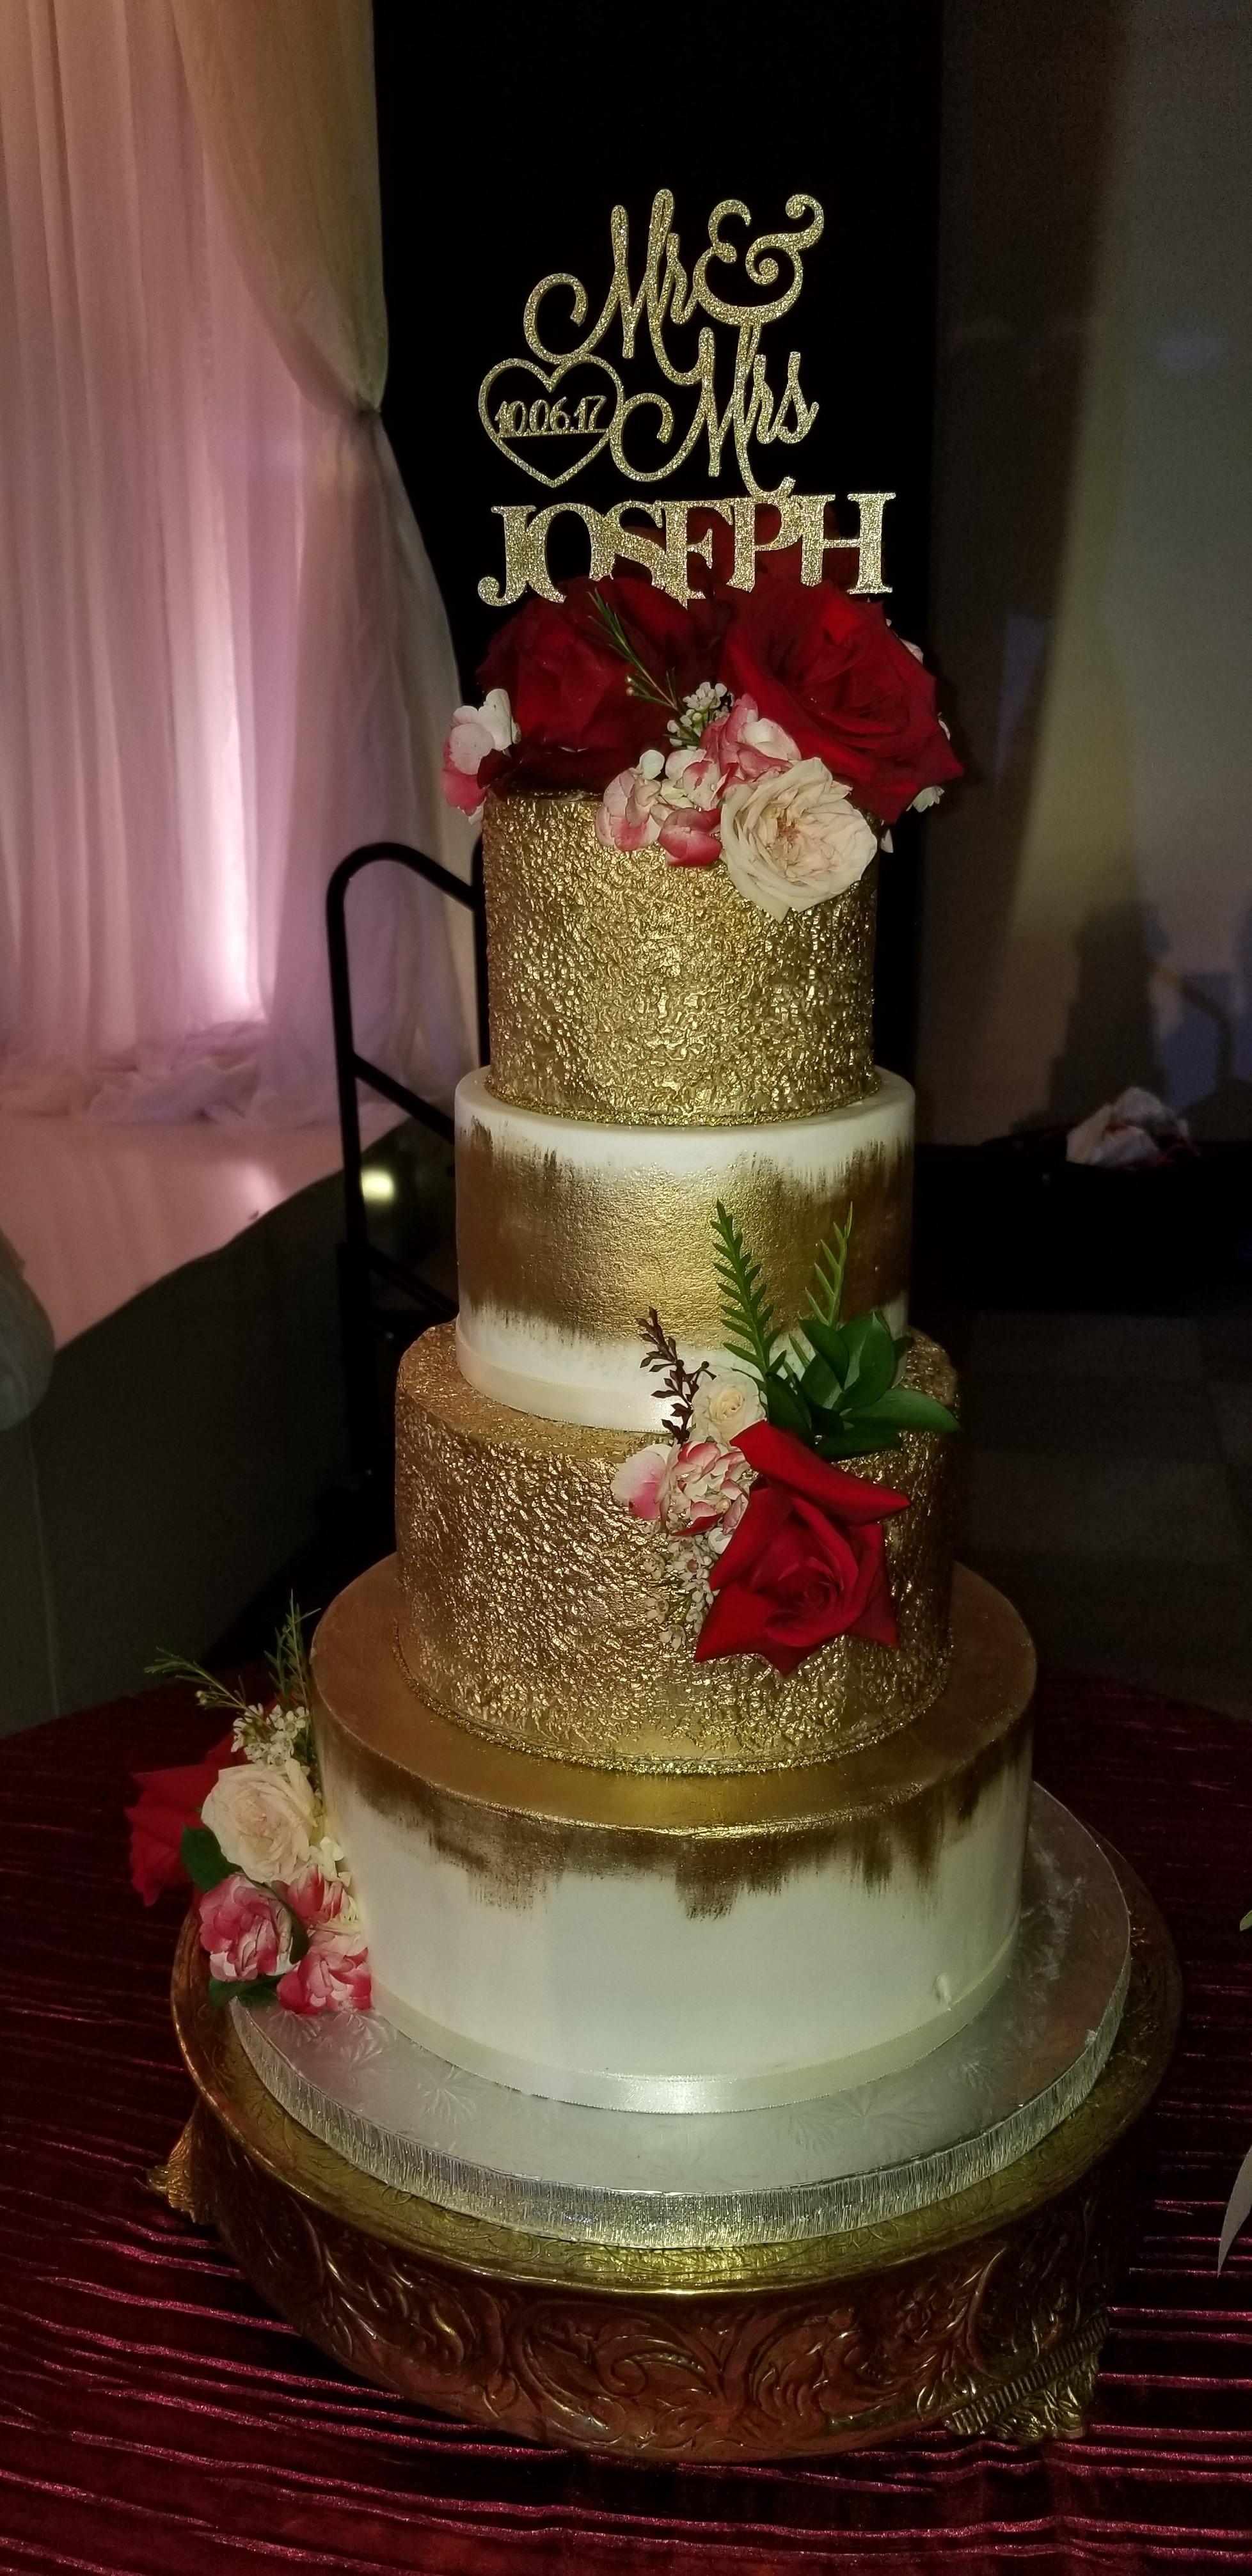 Wedding Cakes by Tammy Allen image 22